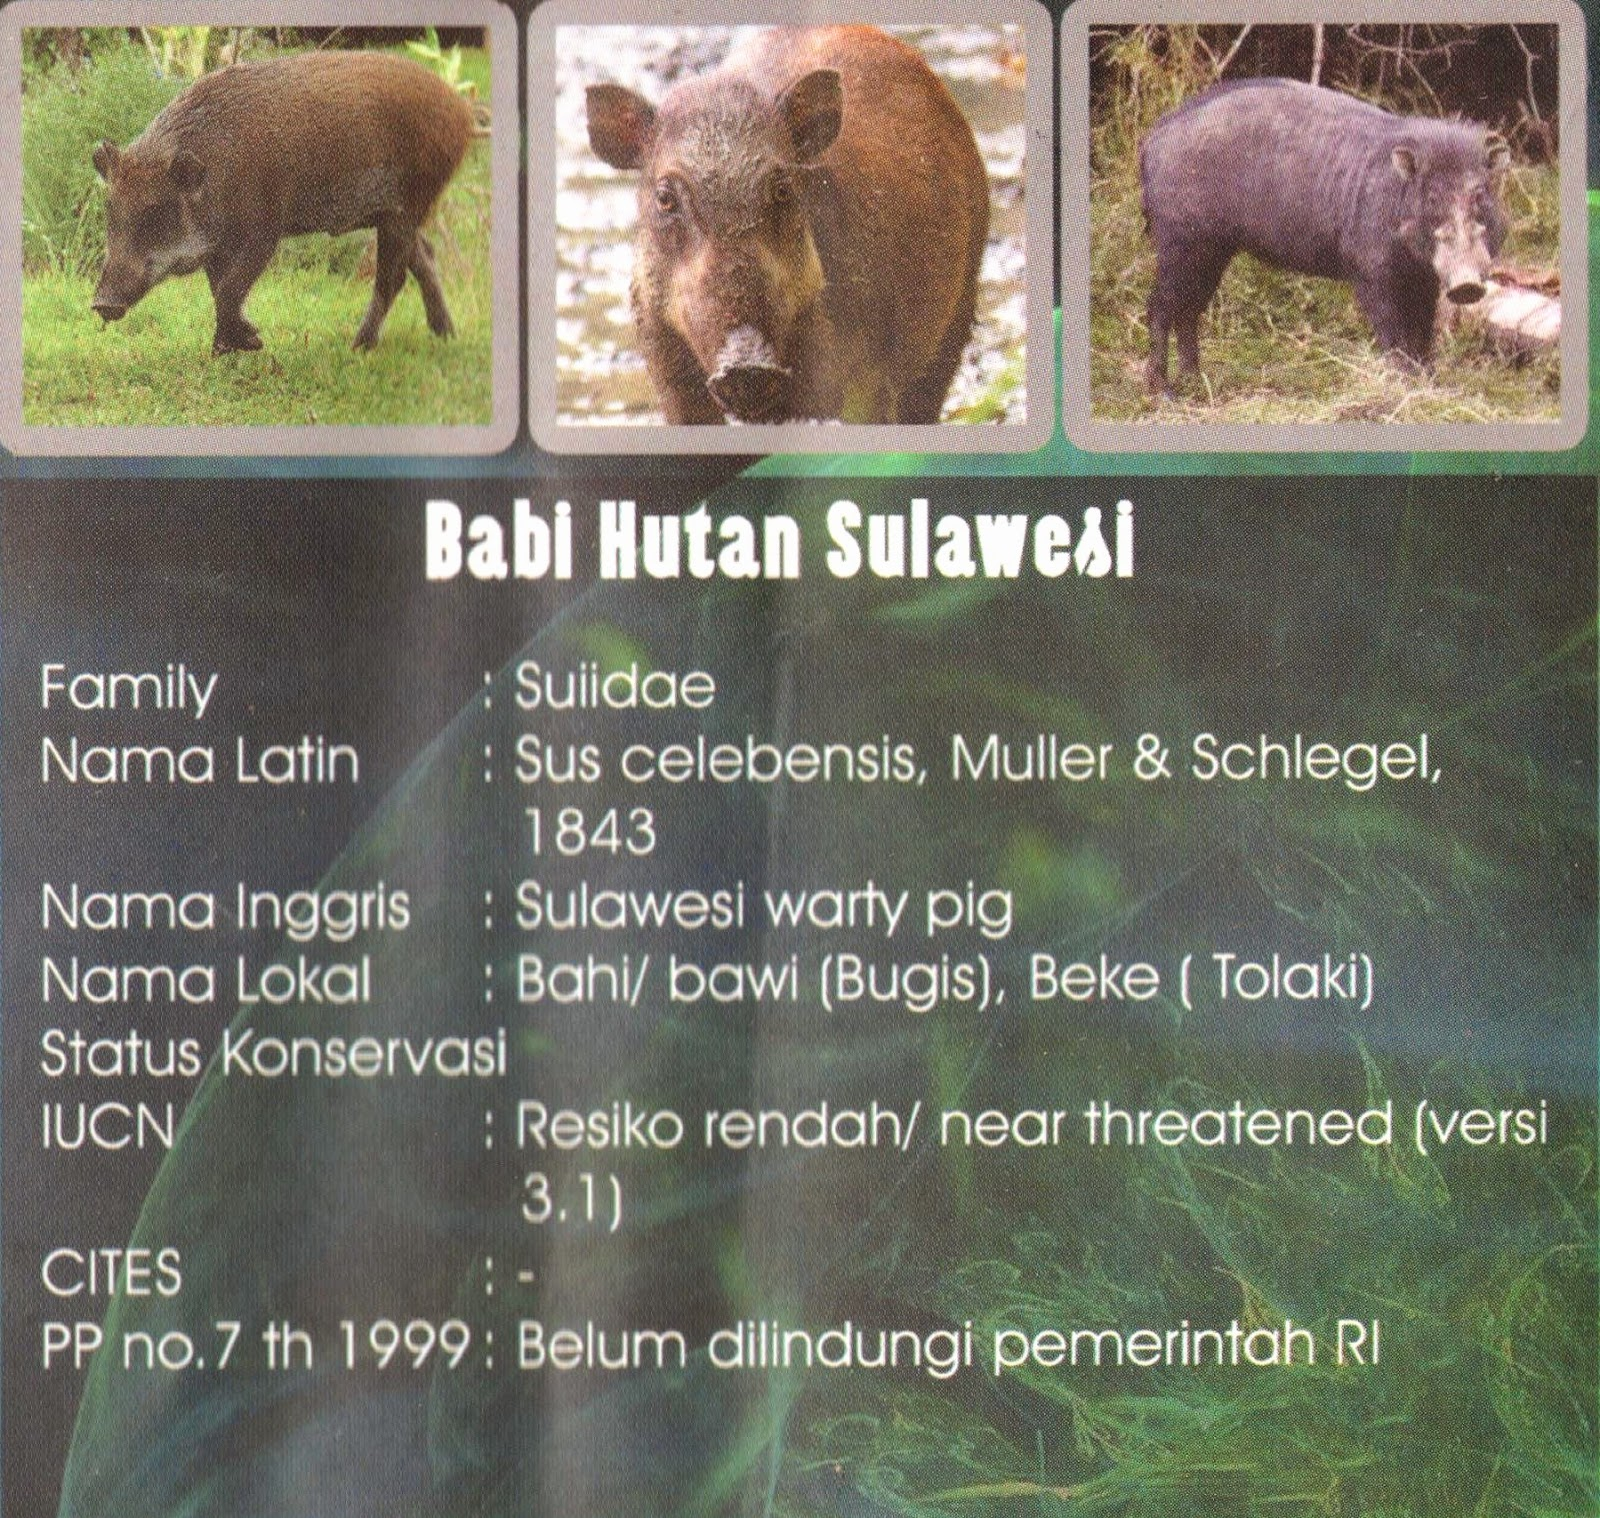 Babi Hutan Sulawesi